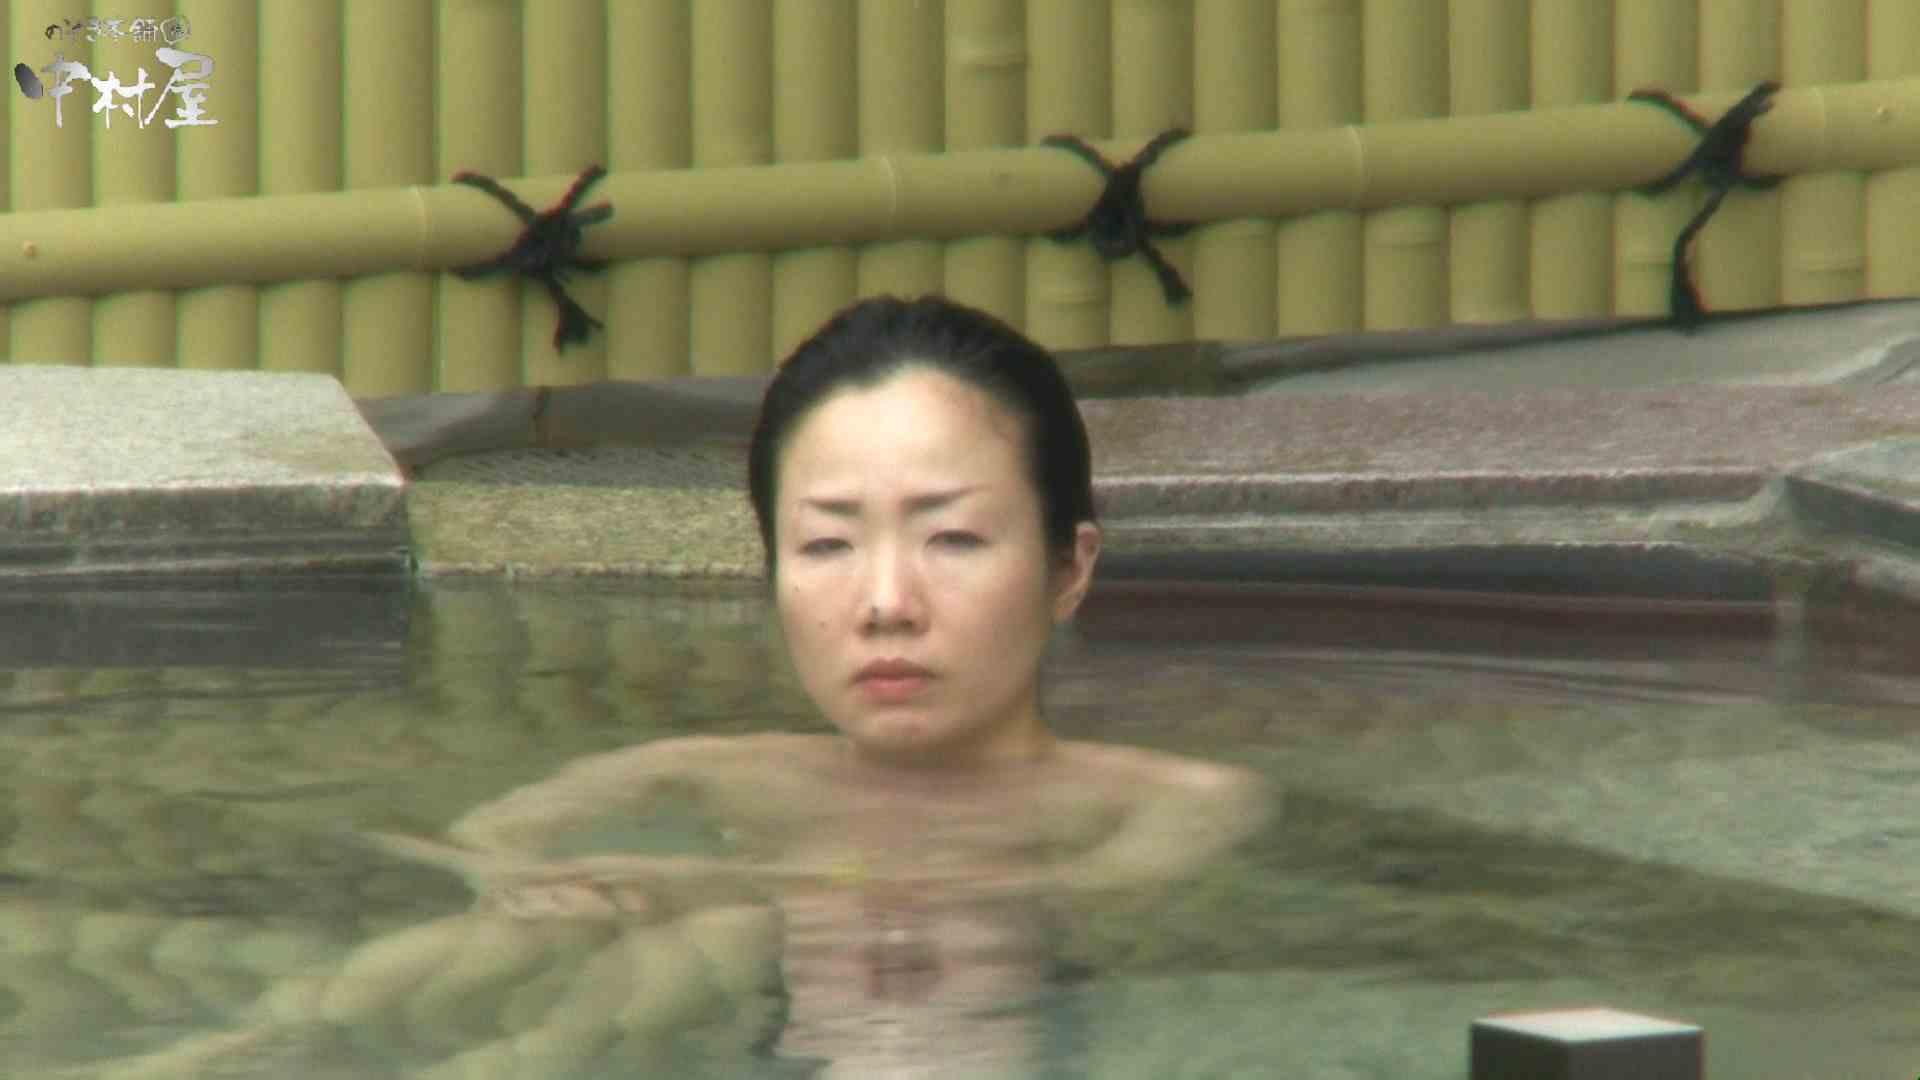 Aquaな露天風呂Vol.950 盗撮シリーズ   露天風呂編  80PIX 23